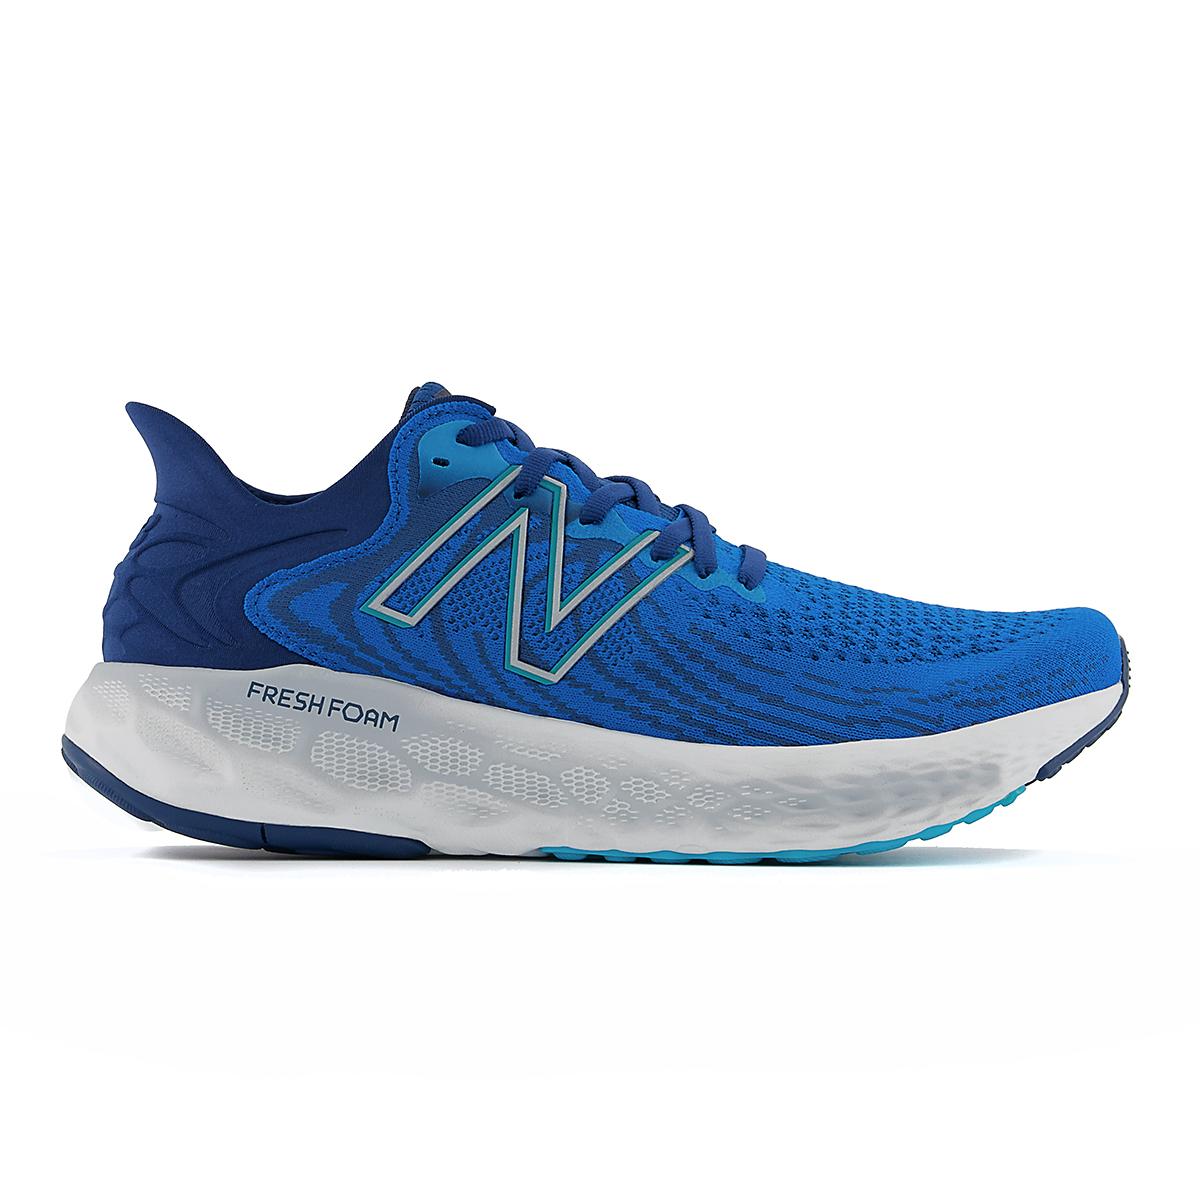 Men's New Balance Fresh Foam 1080v11 Running Shoe - Color: Wave/Light Rogue Wave - Size: 6 - Width: Wide, Wave/Light Rogue Wave, large, image 1